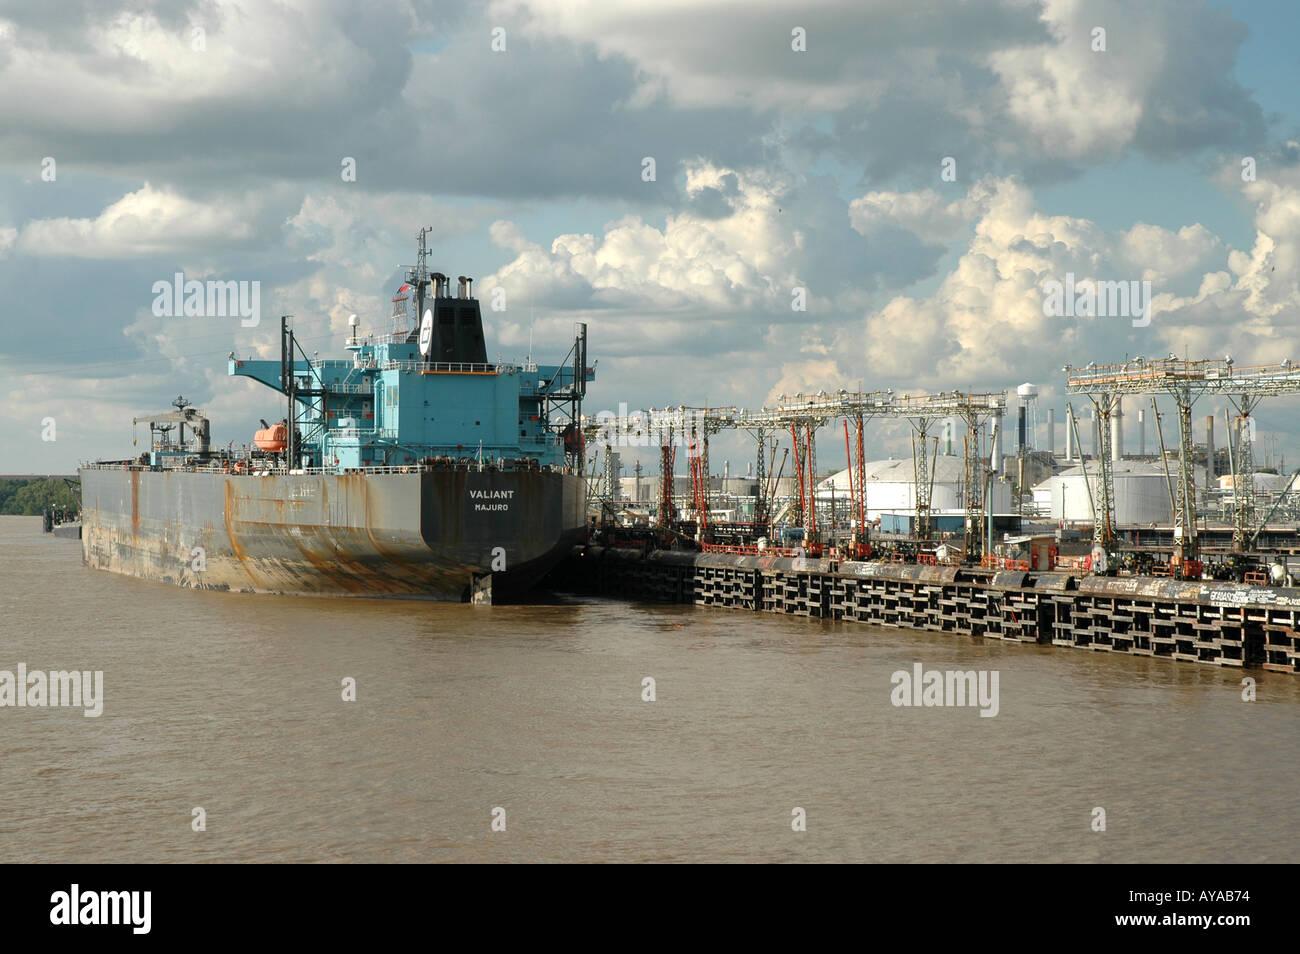 Baton Rouge LA Louisiana oil refinery shipping dock - Stock Image